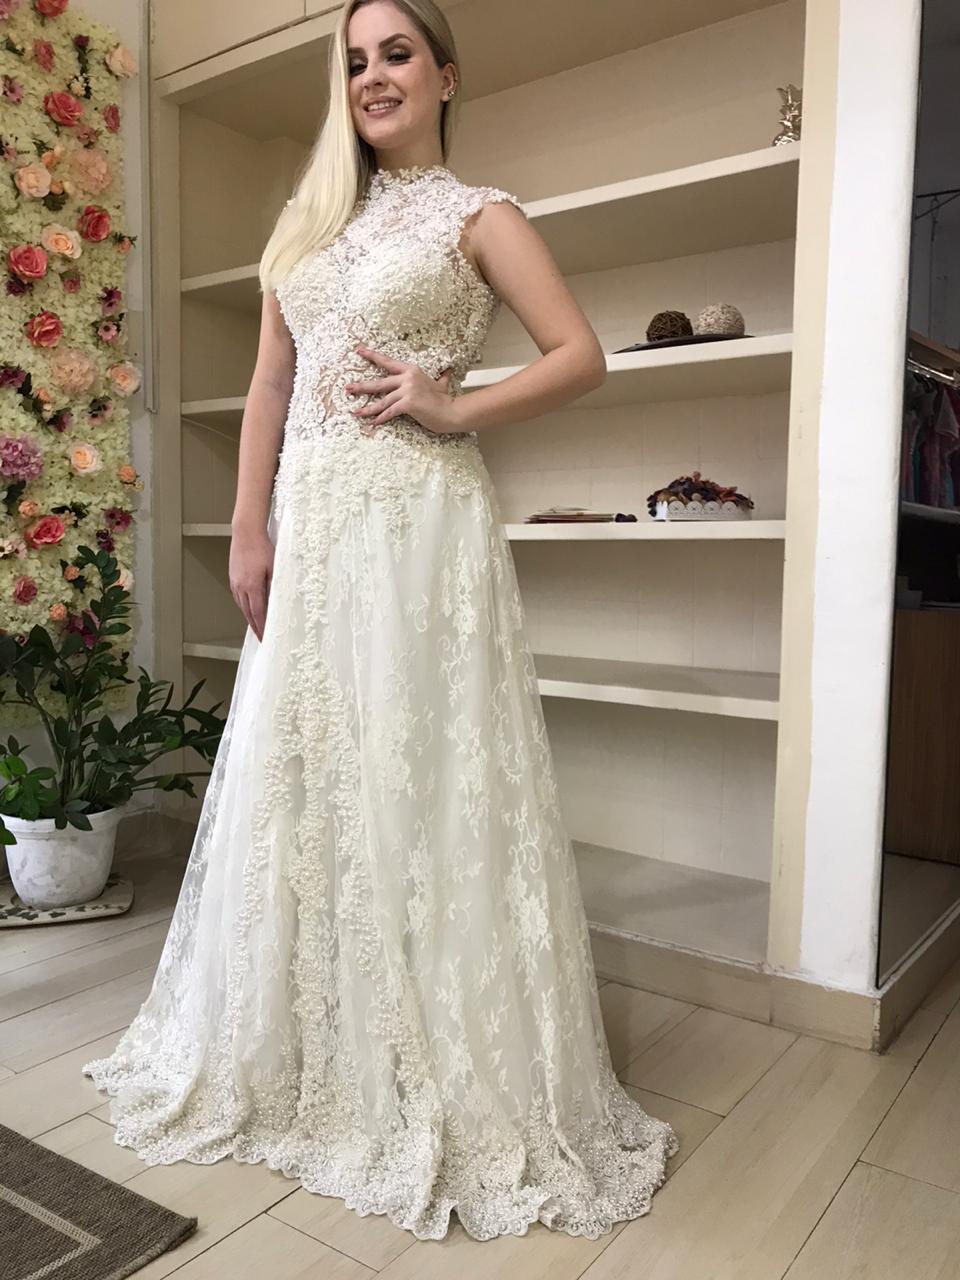 Moda noiva vestido de noiva alta costura no Tatuapé